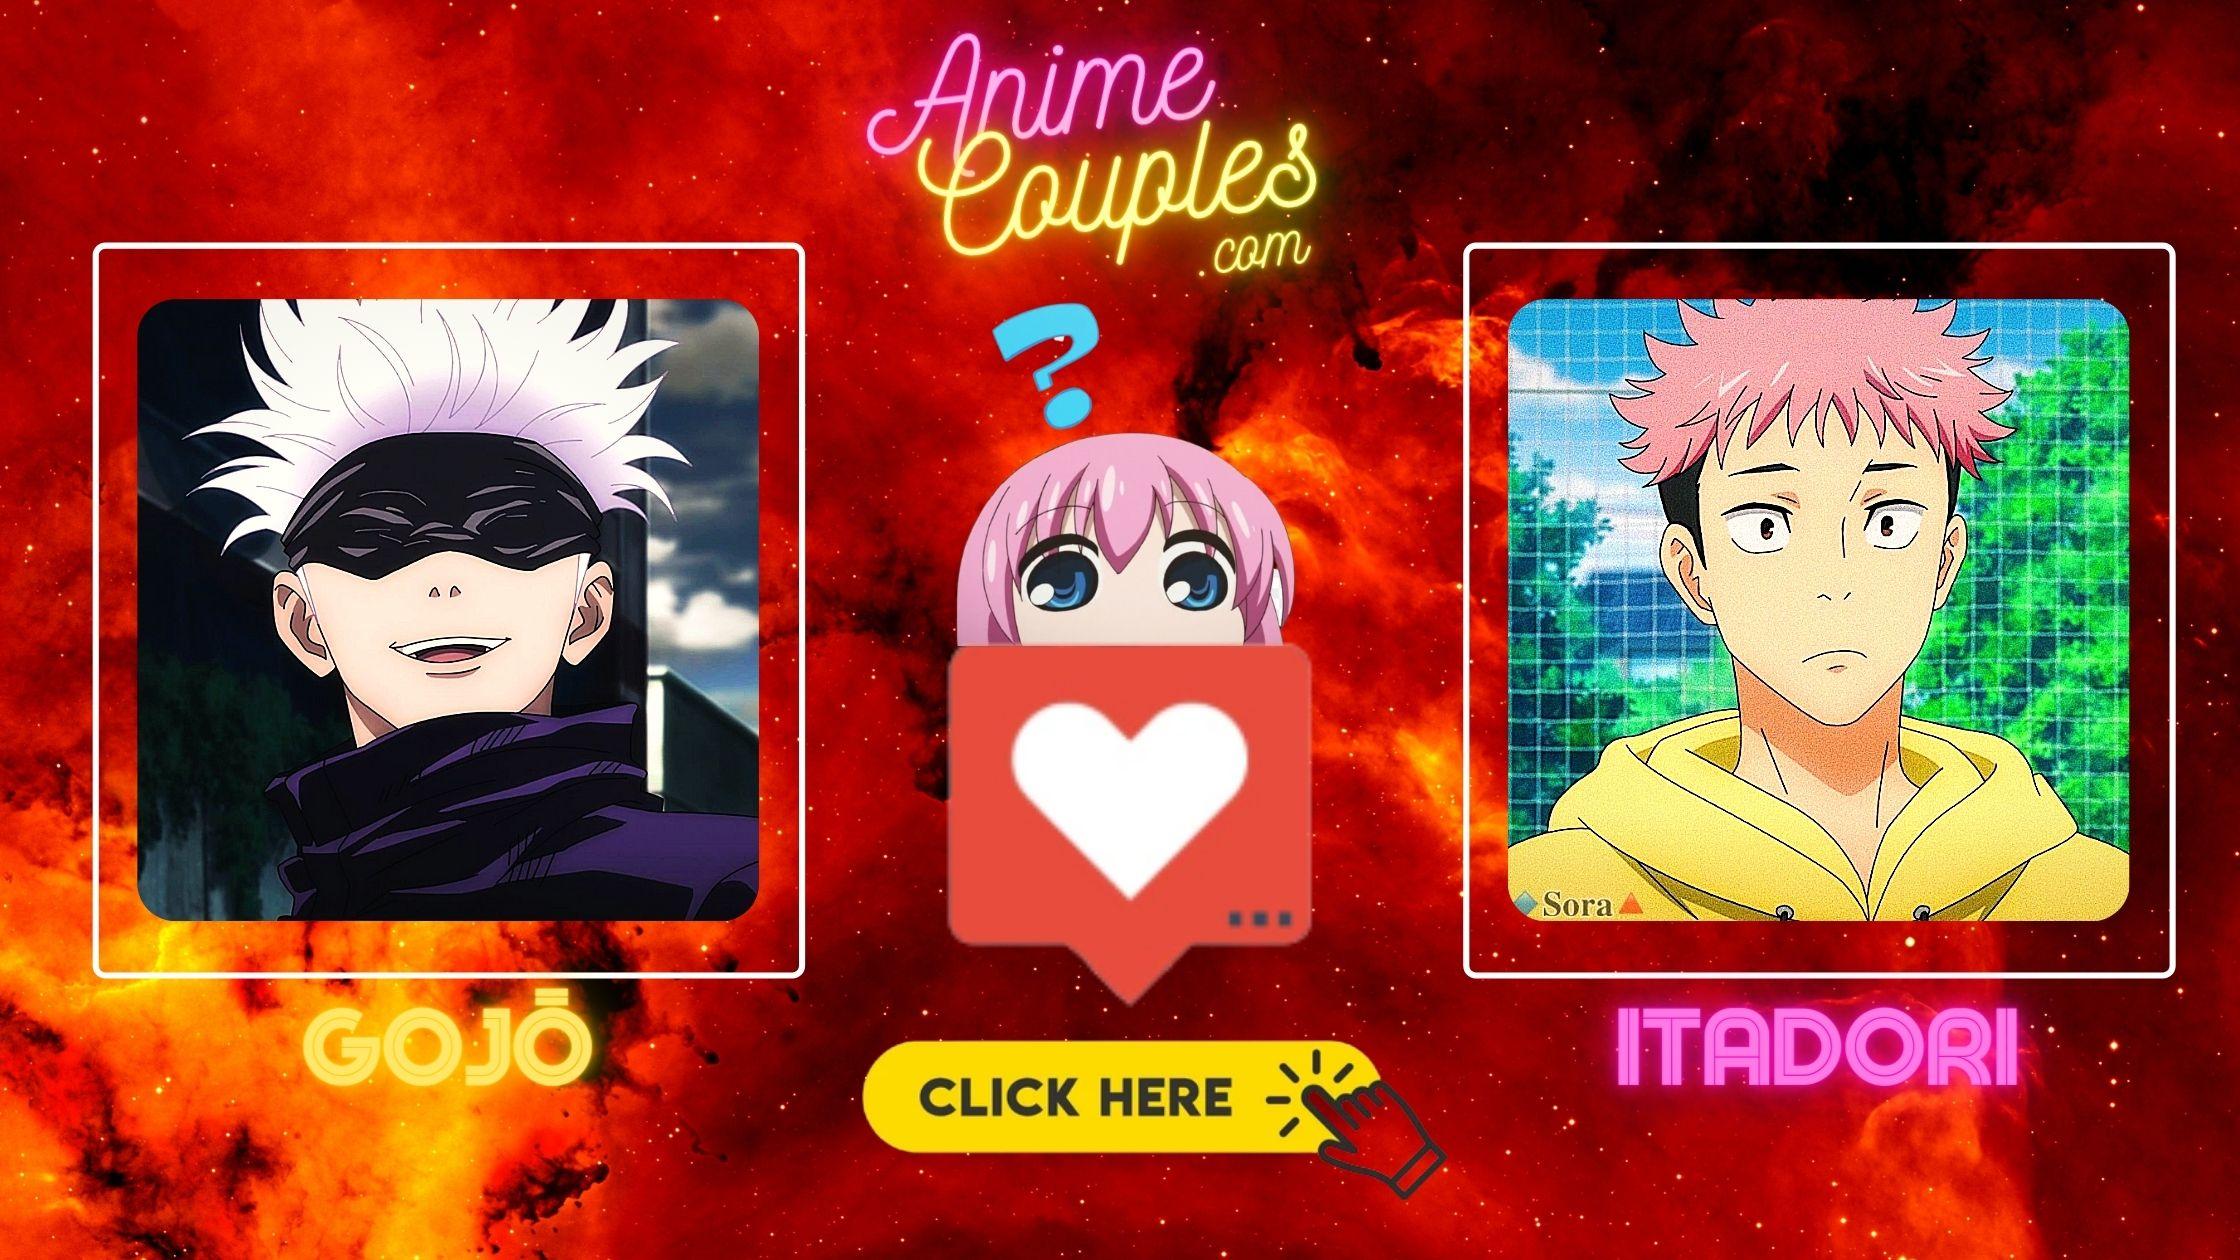 Gojo and Itadori - The Jujutsu Kaisen couples